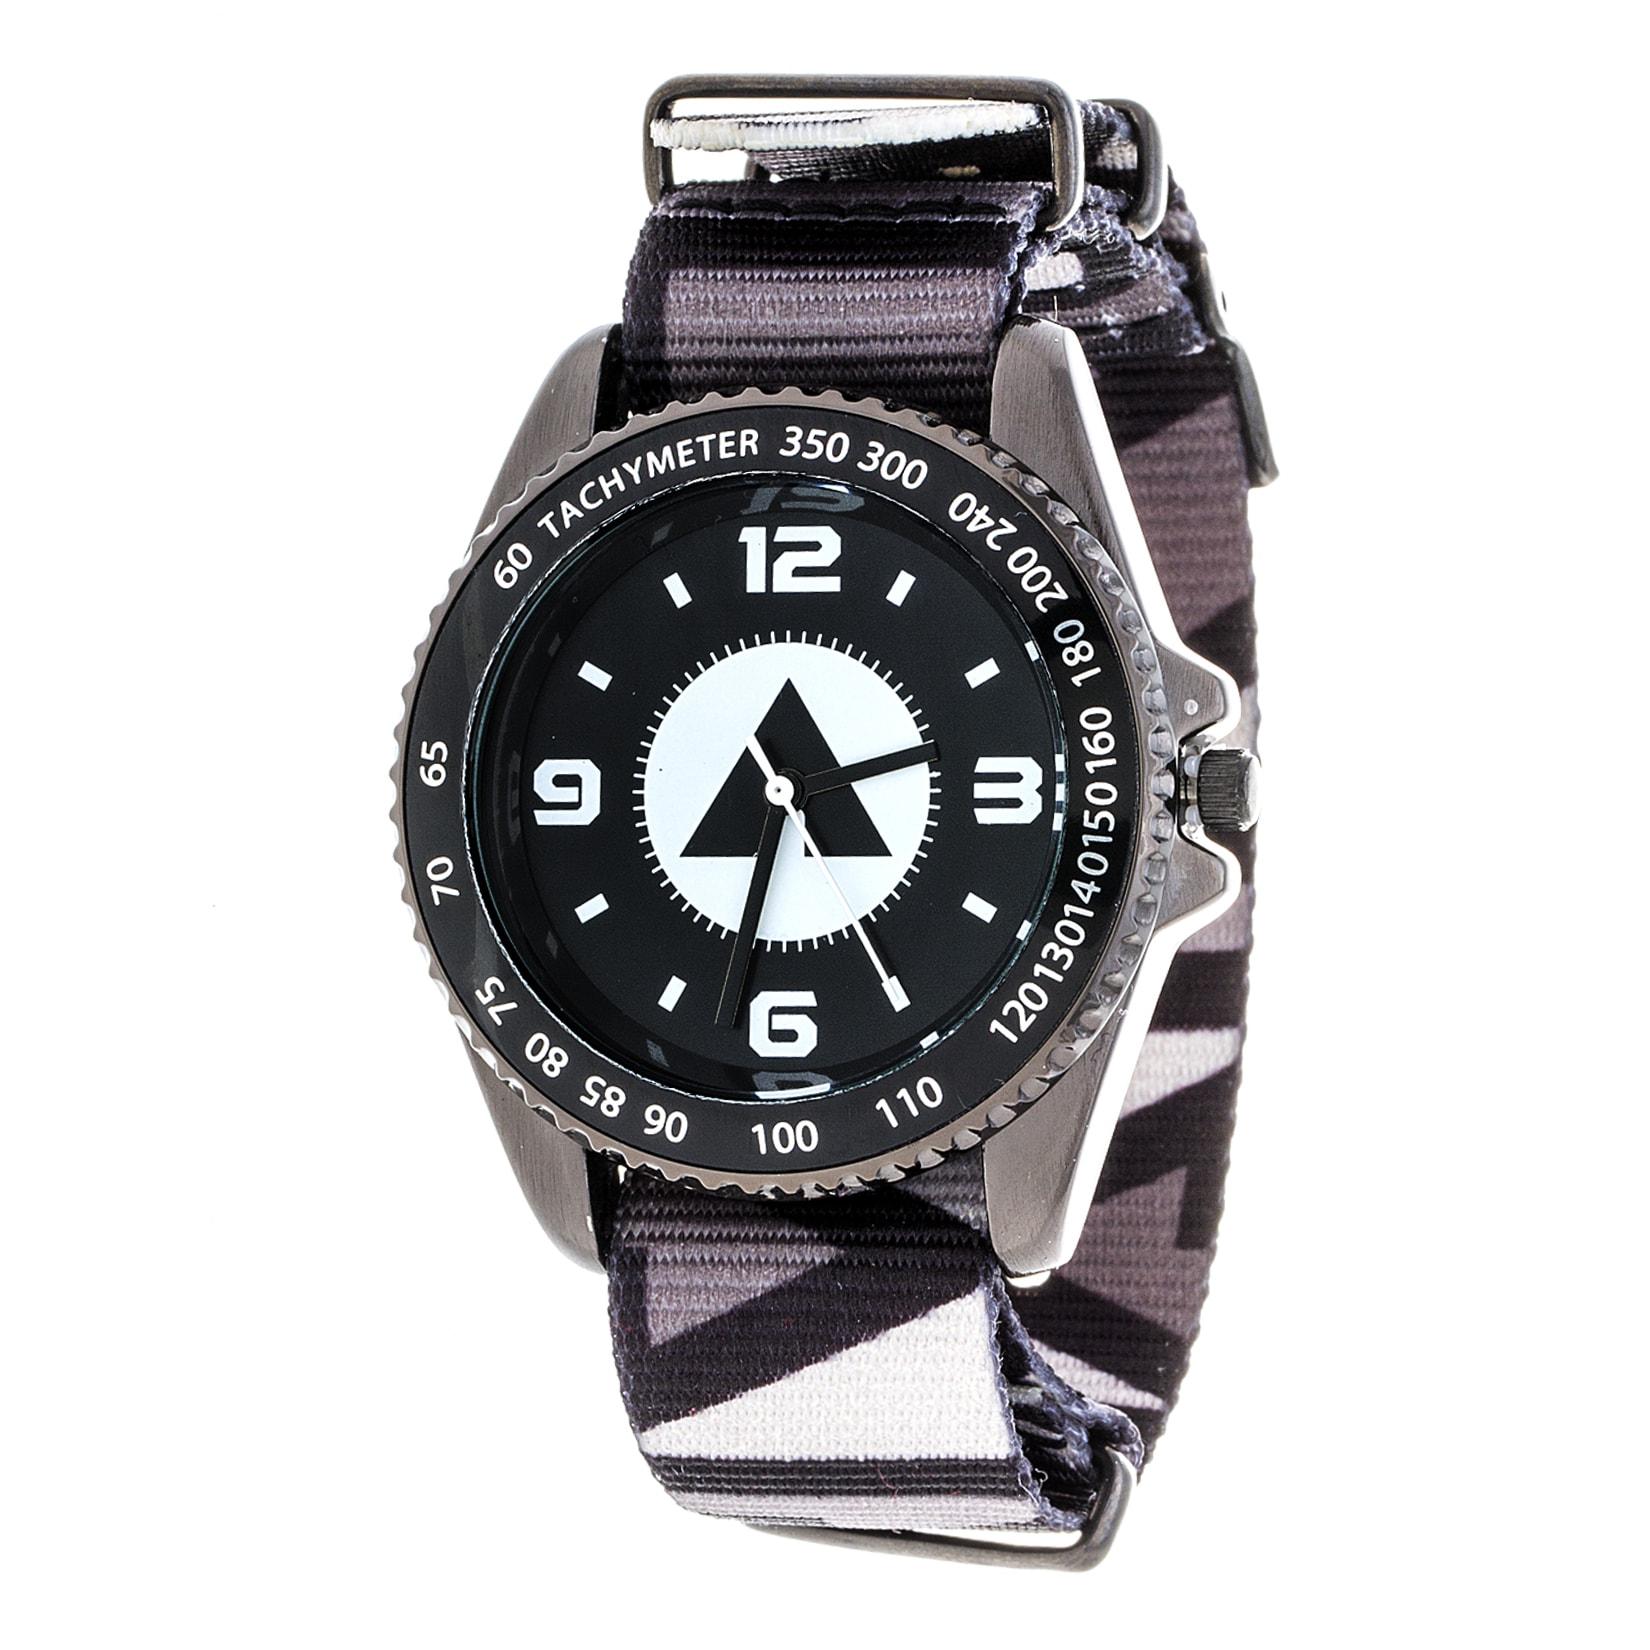 XTREME Airwalk Metal Alloy Case w/ Black Designed Cloth S...